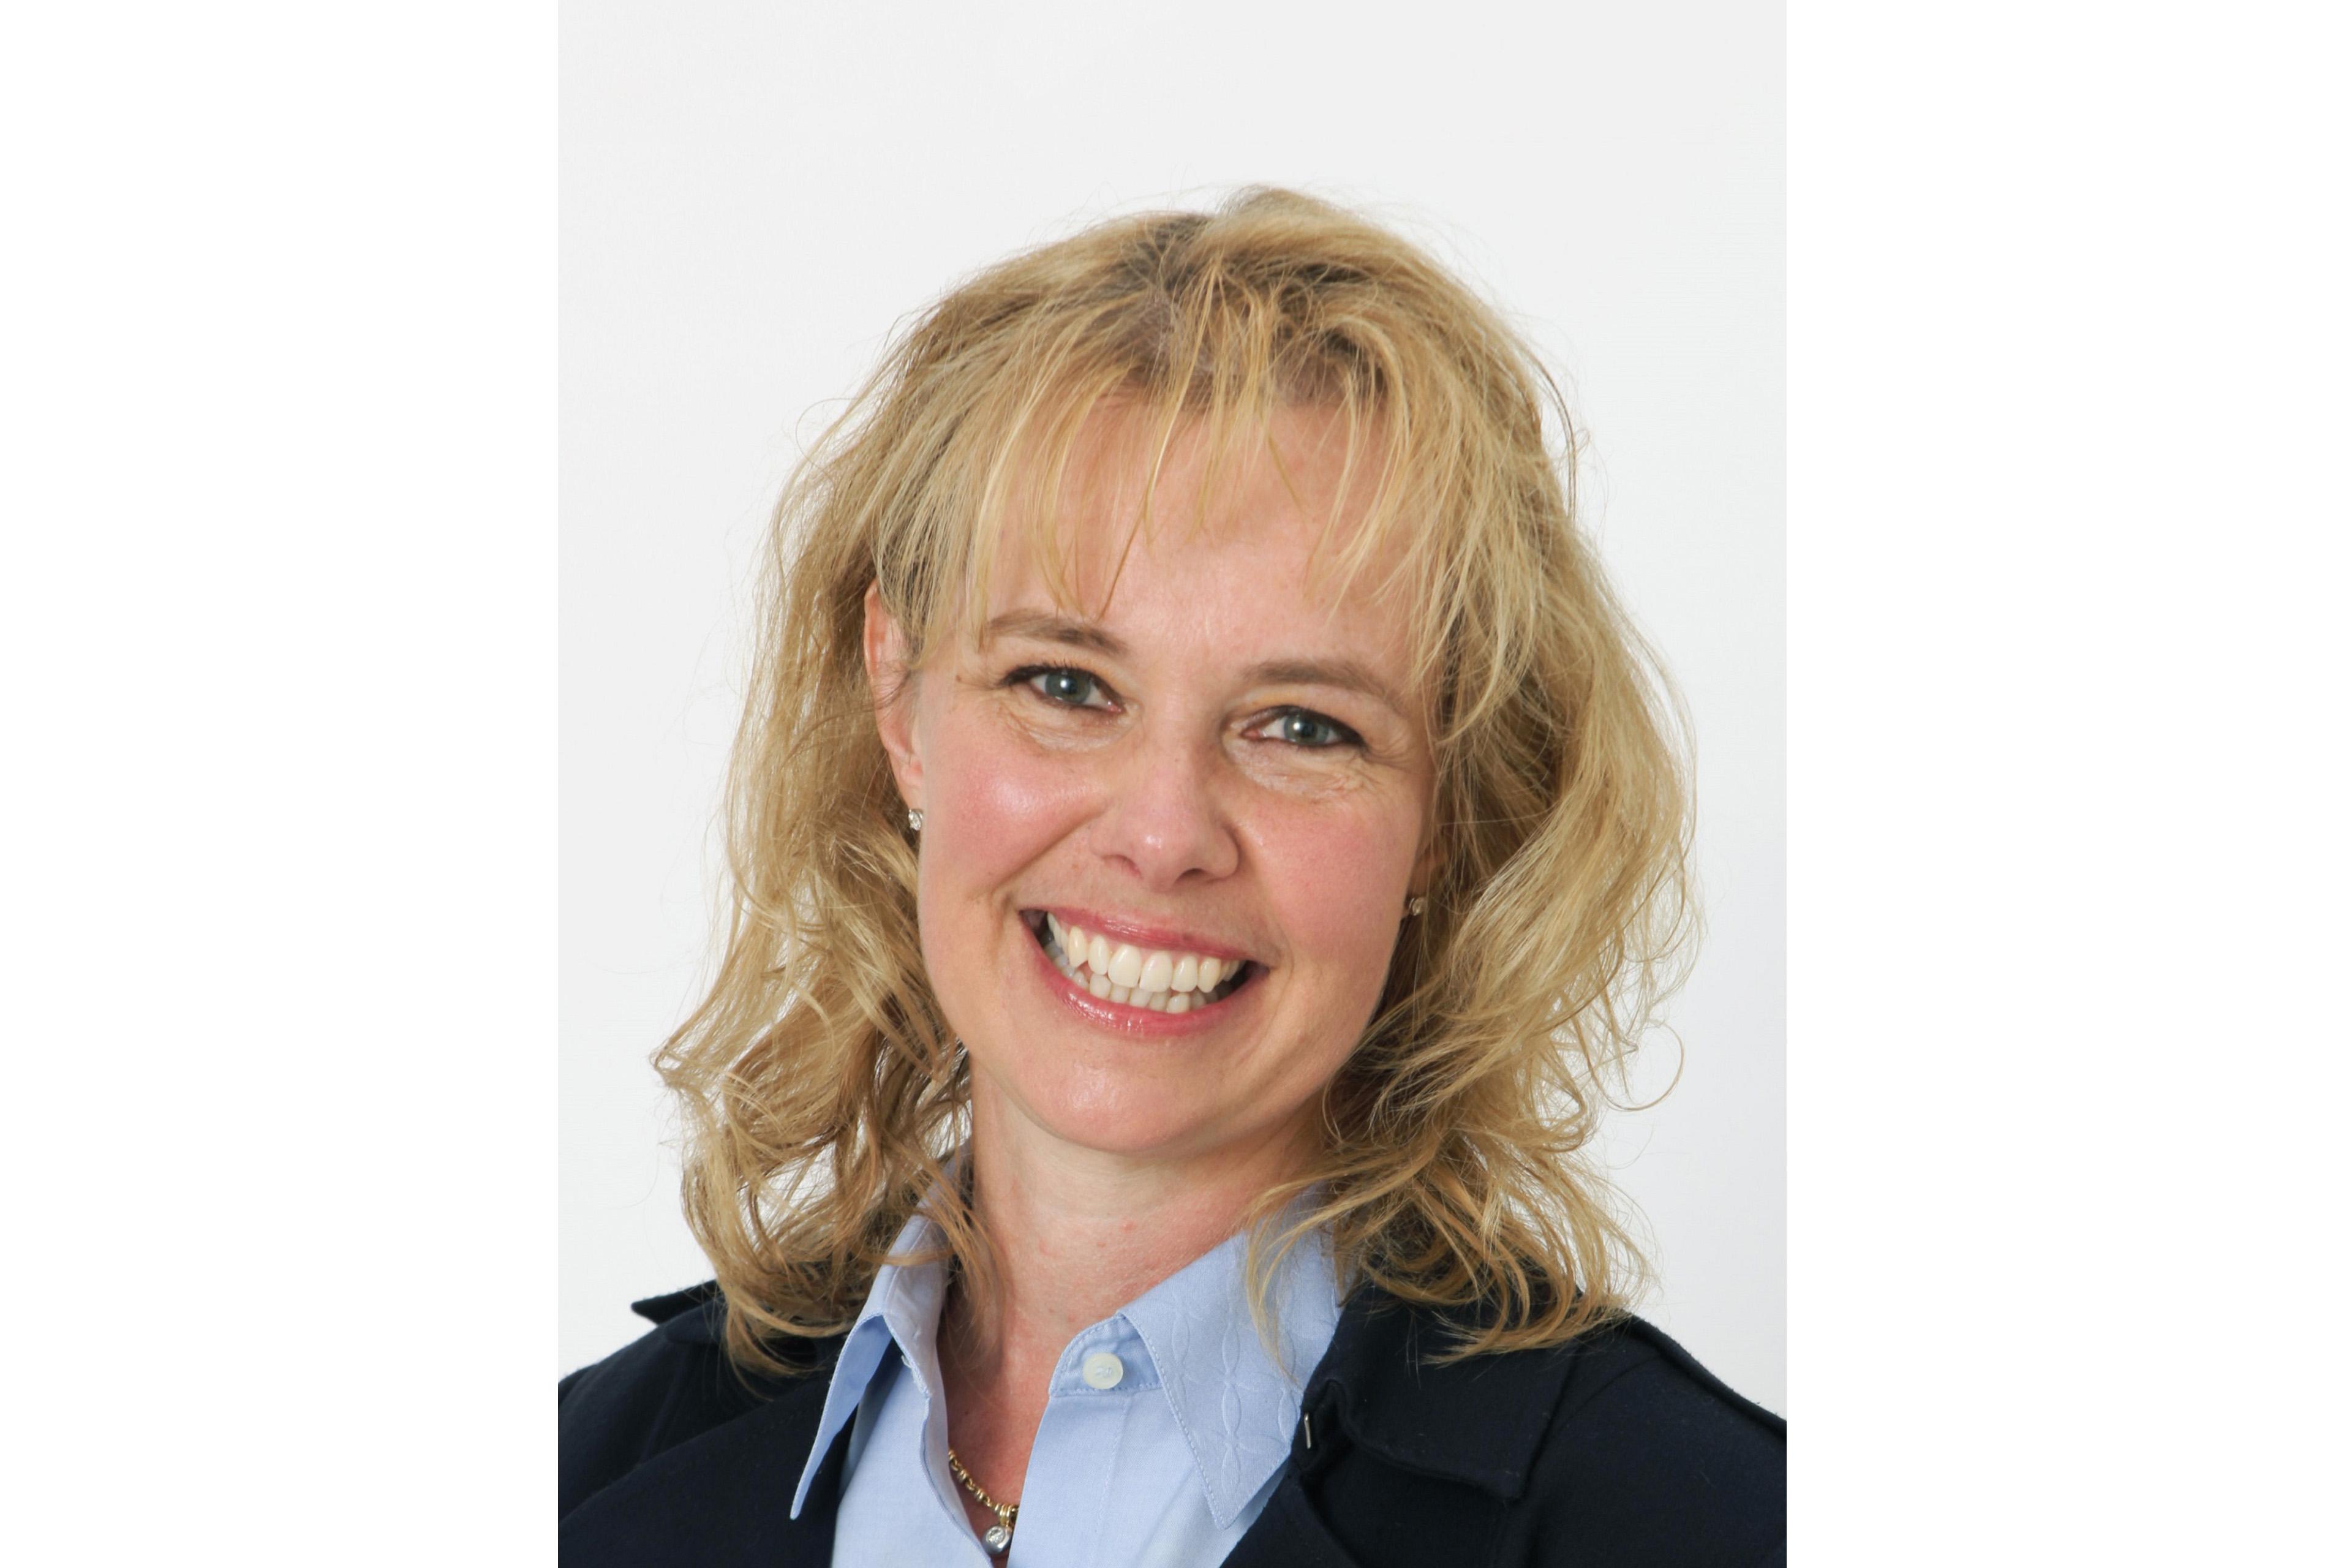 Christina Lampe Onnerud